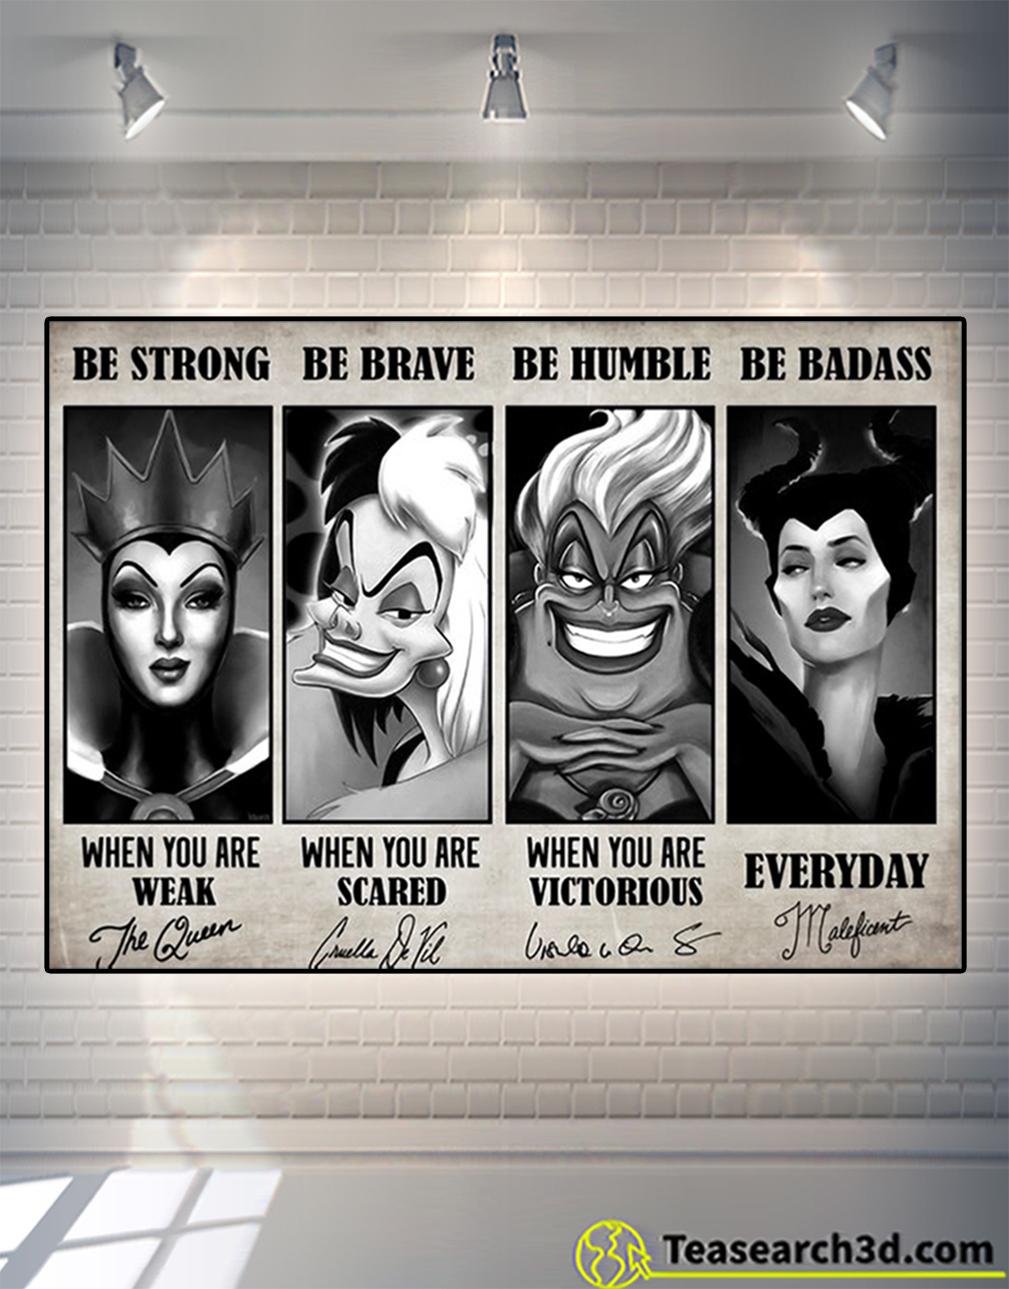 Evil queen Cruella de Vil ursula maleficent be strong be brave be humble be badass canvas